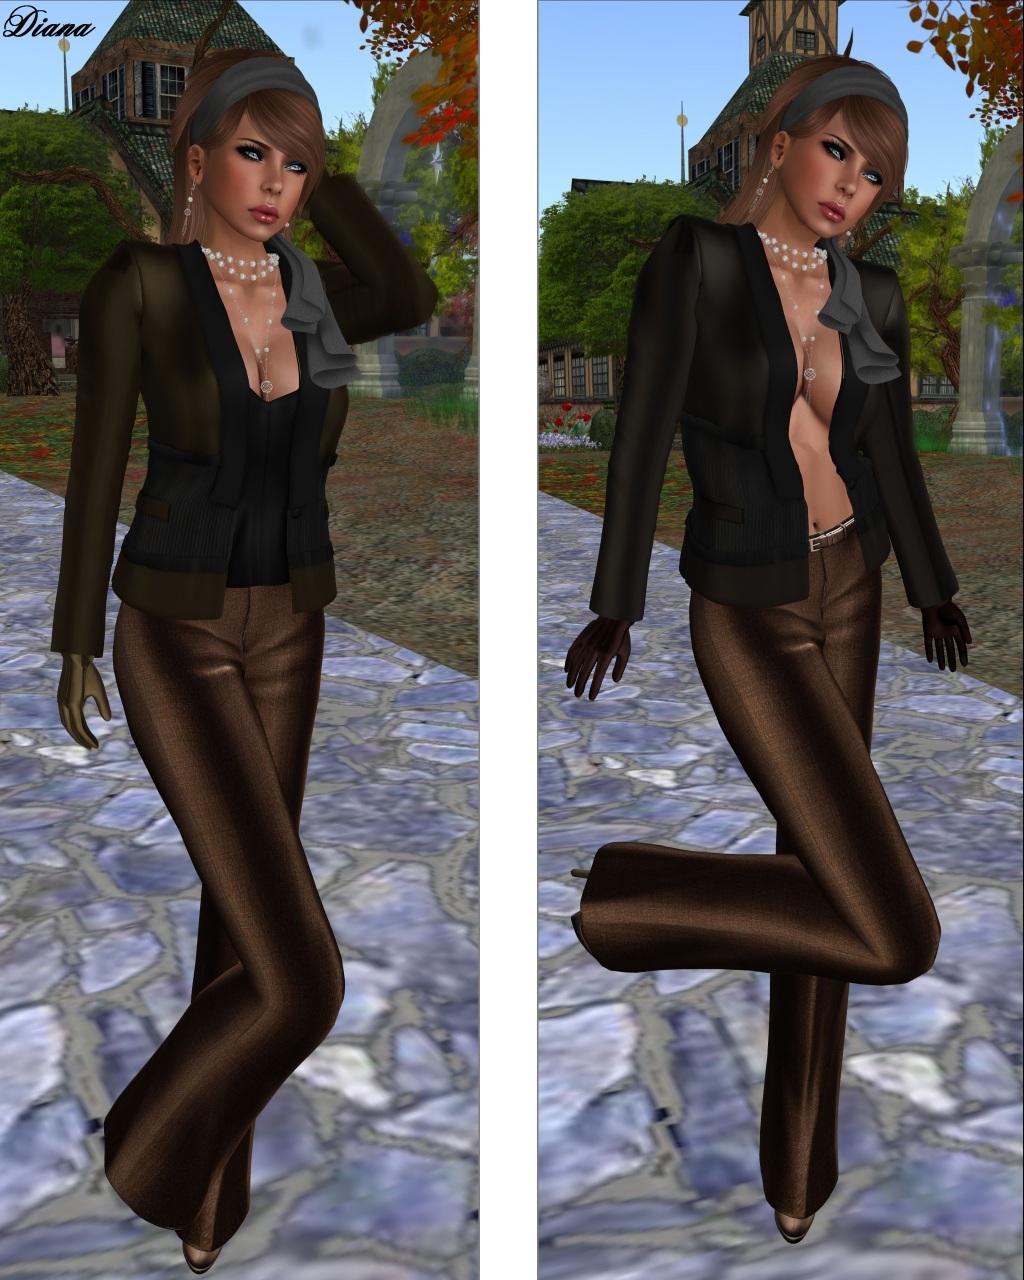 Baiastice - Emma Jacket brown and chocolate